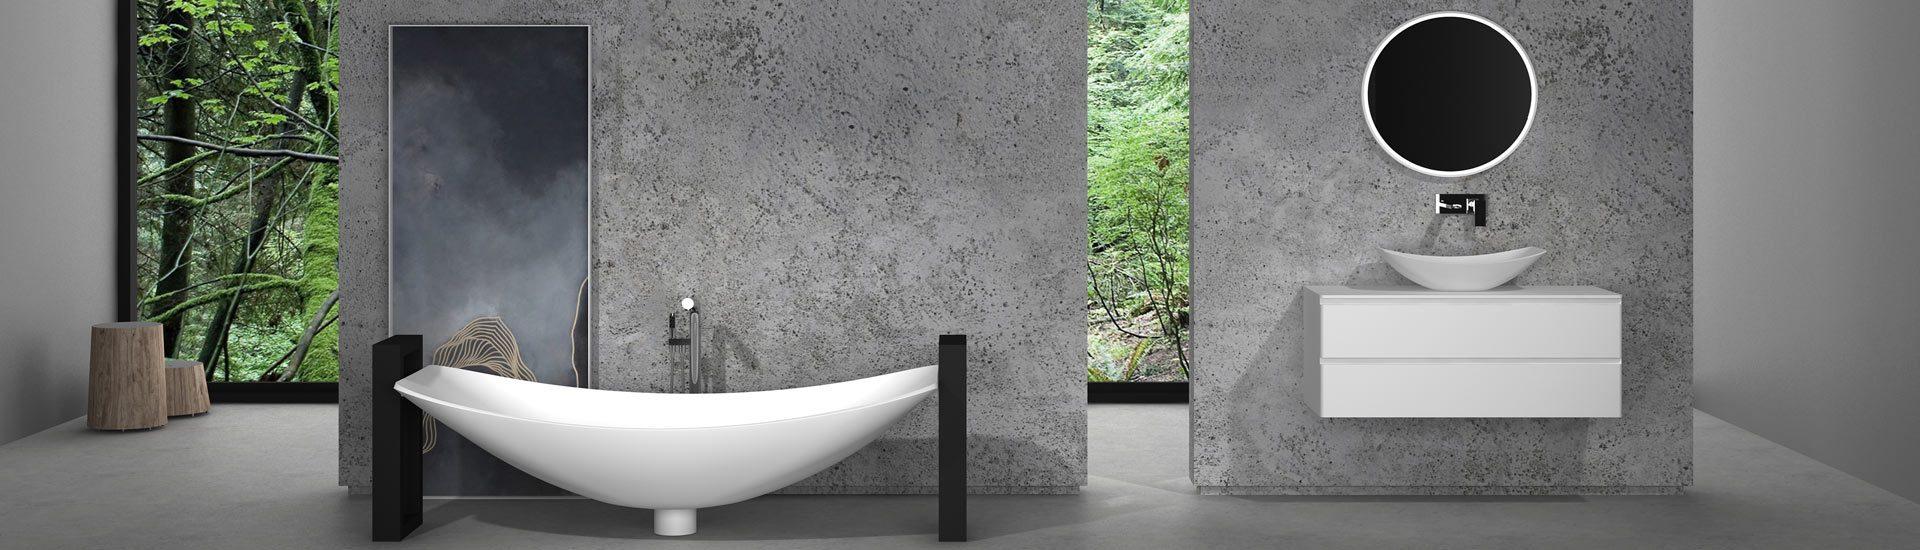 Freestanding Bathtub: Luxurious Oasis Hammock Bath with Steel frame